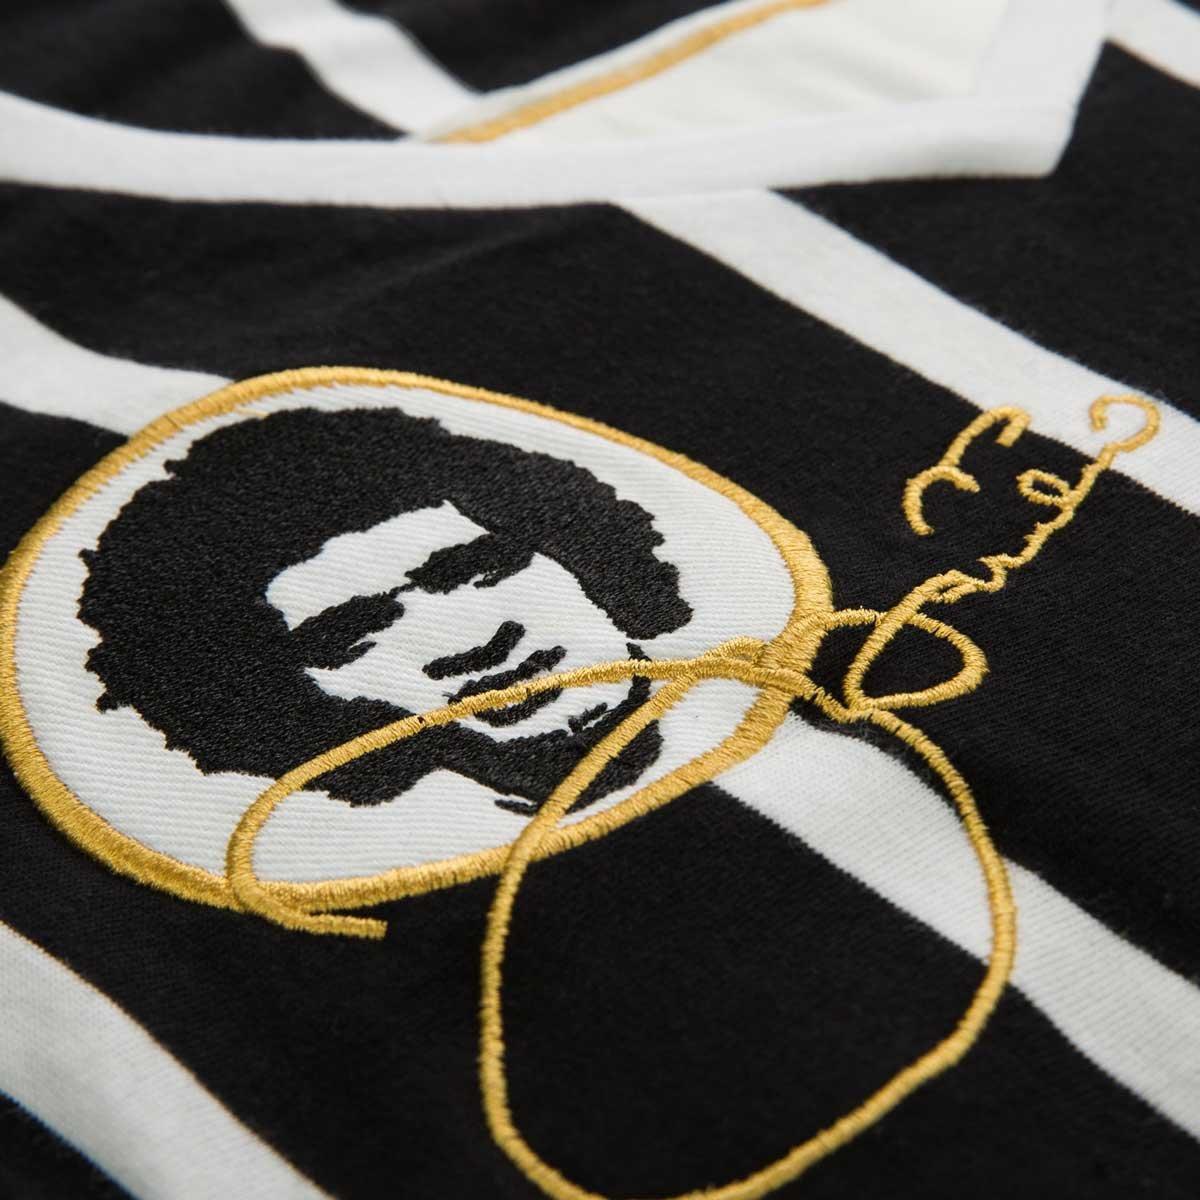 ... Camisa Corinthians Baby Look Retrô Gol Basílio 77 Torcedor Feminina ... 4224396d9df69